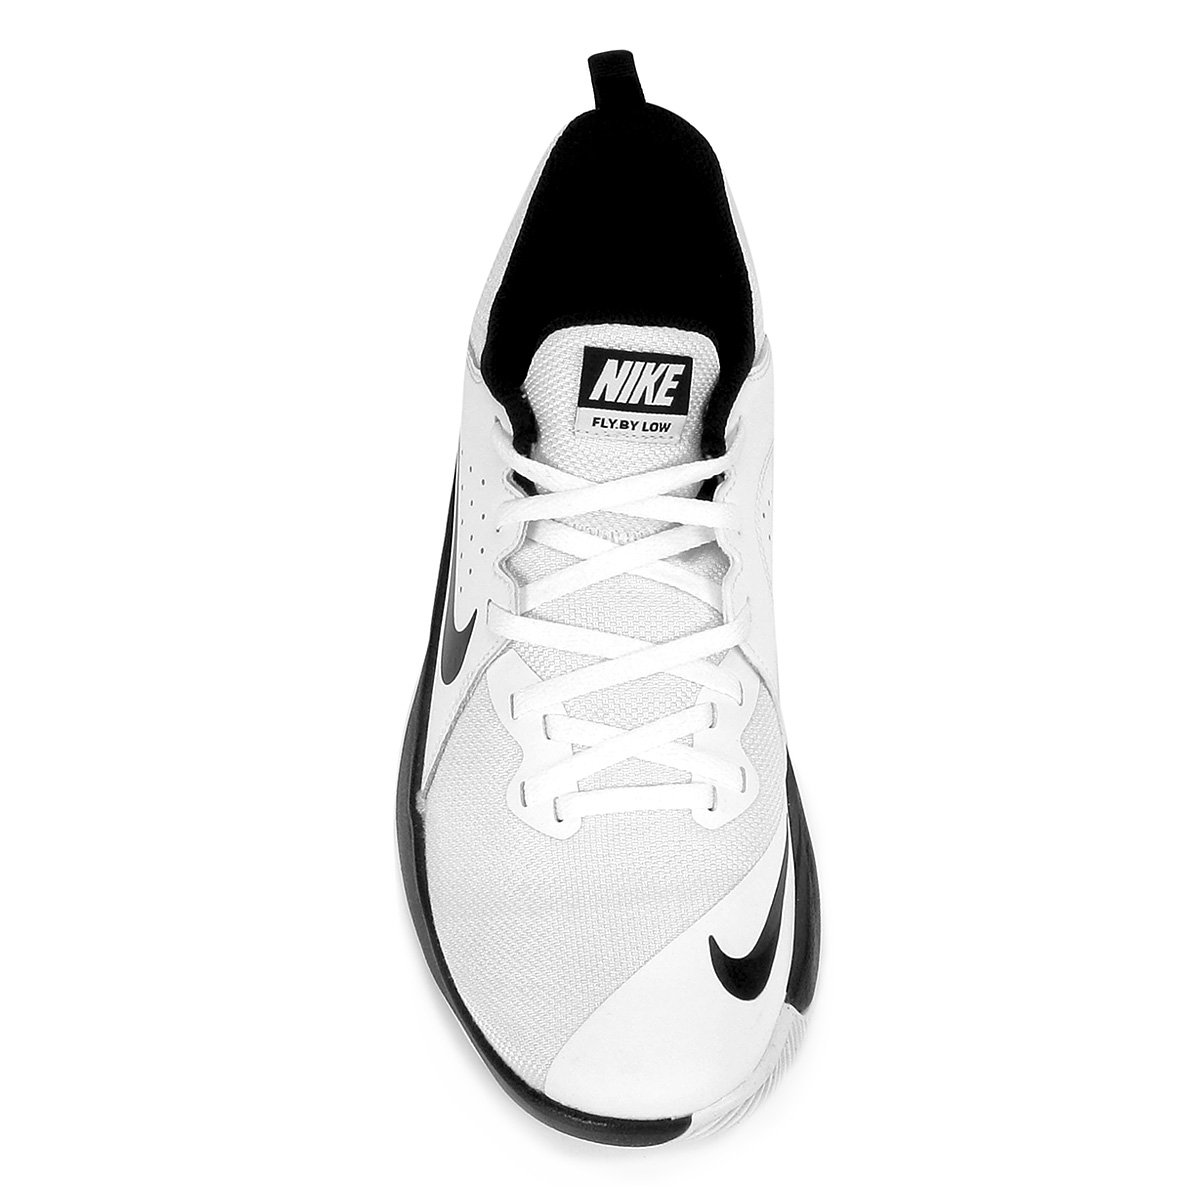 Tênis e Tênis Masculino By Nike Fly Nike Low Preto Branco Z5wnw1q8